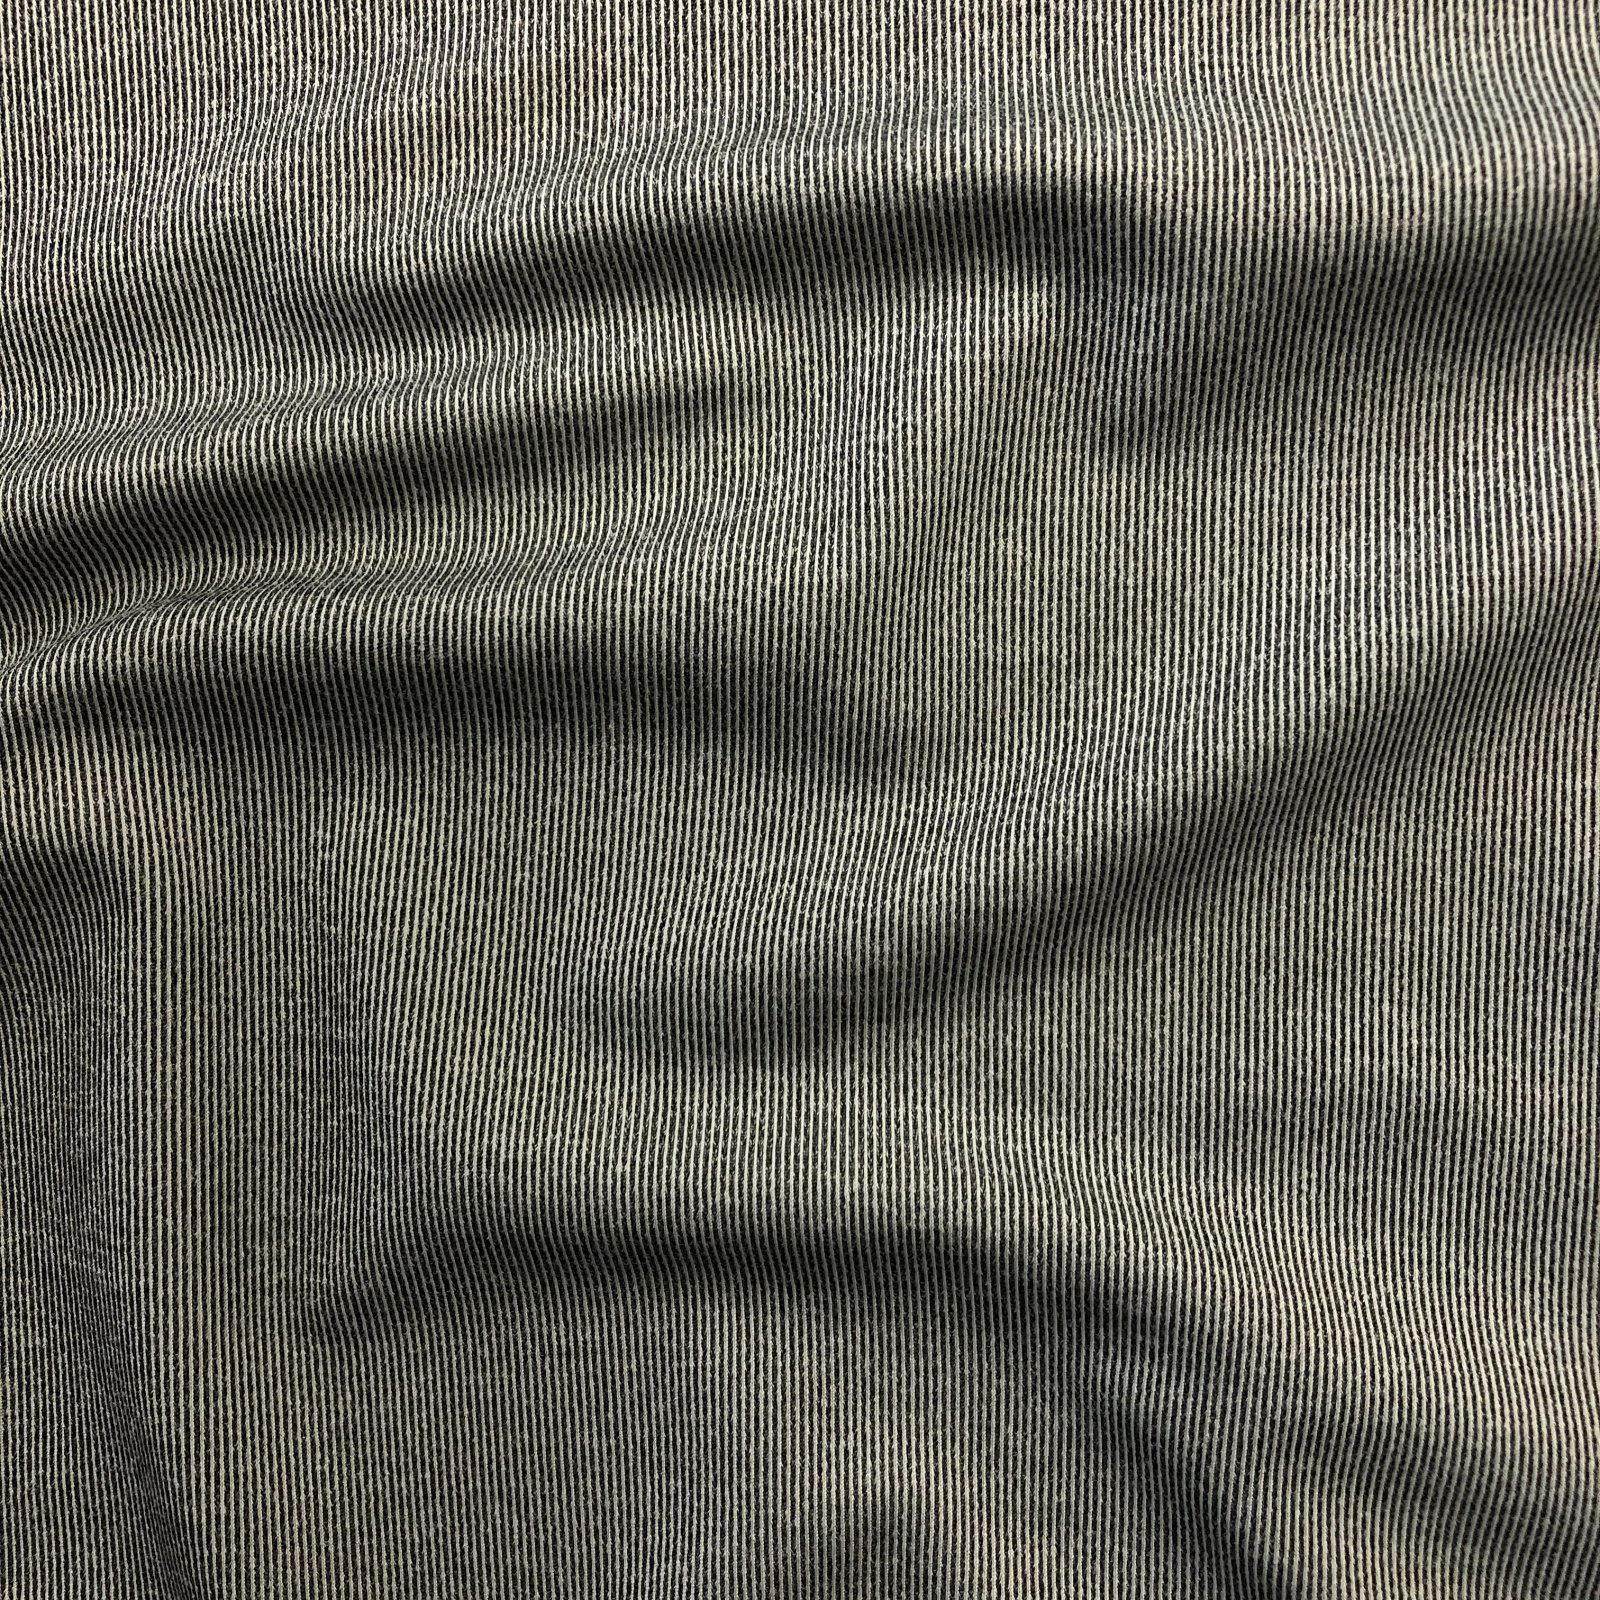 Activewear Microstripe - Grey/White